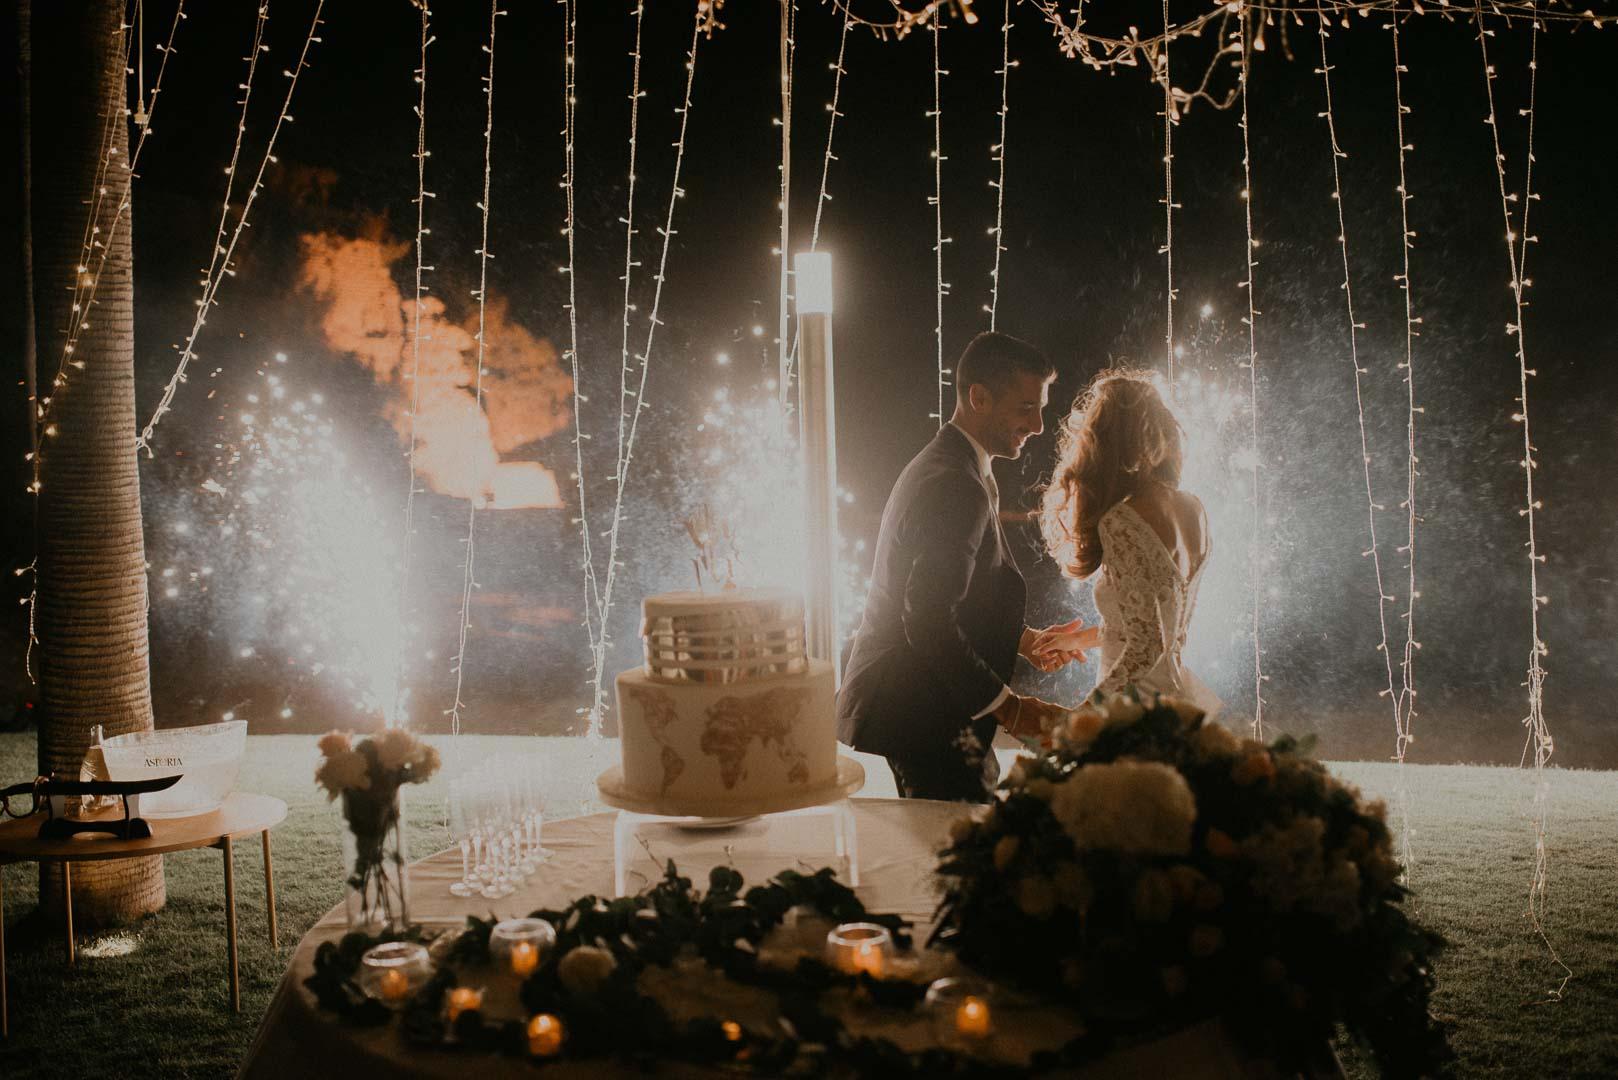 wedding-photographer-destination-fineart-bespoke-reportage-napoli-nabilah-vivianeizzo-spazio46-191